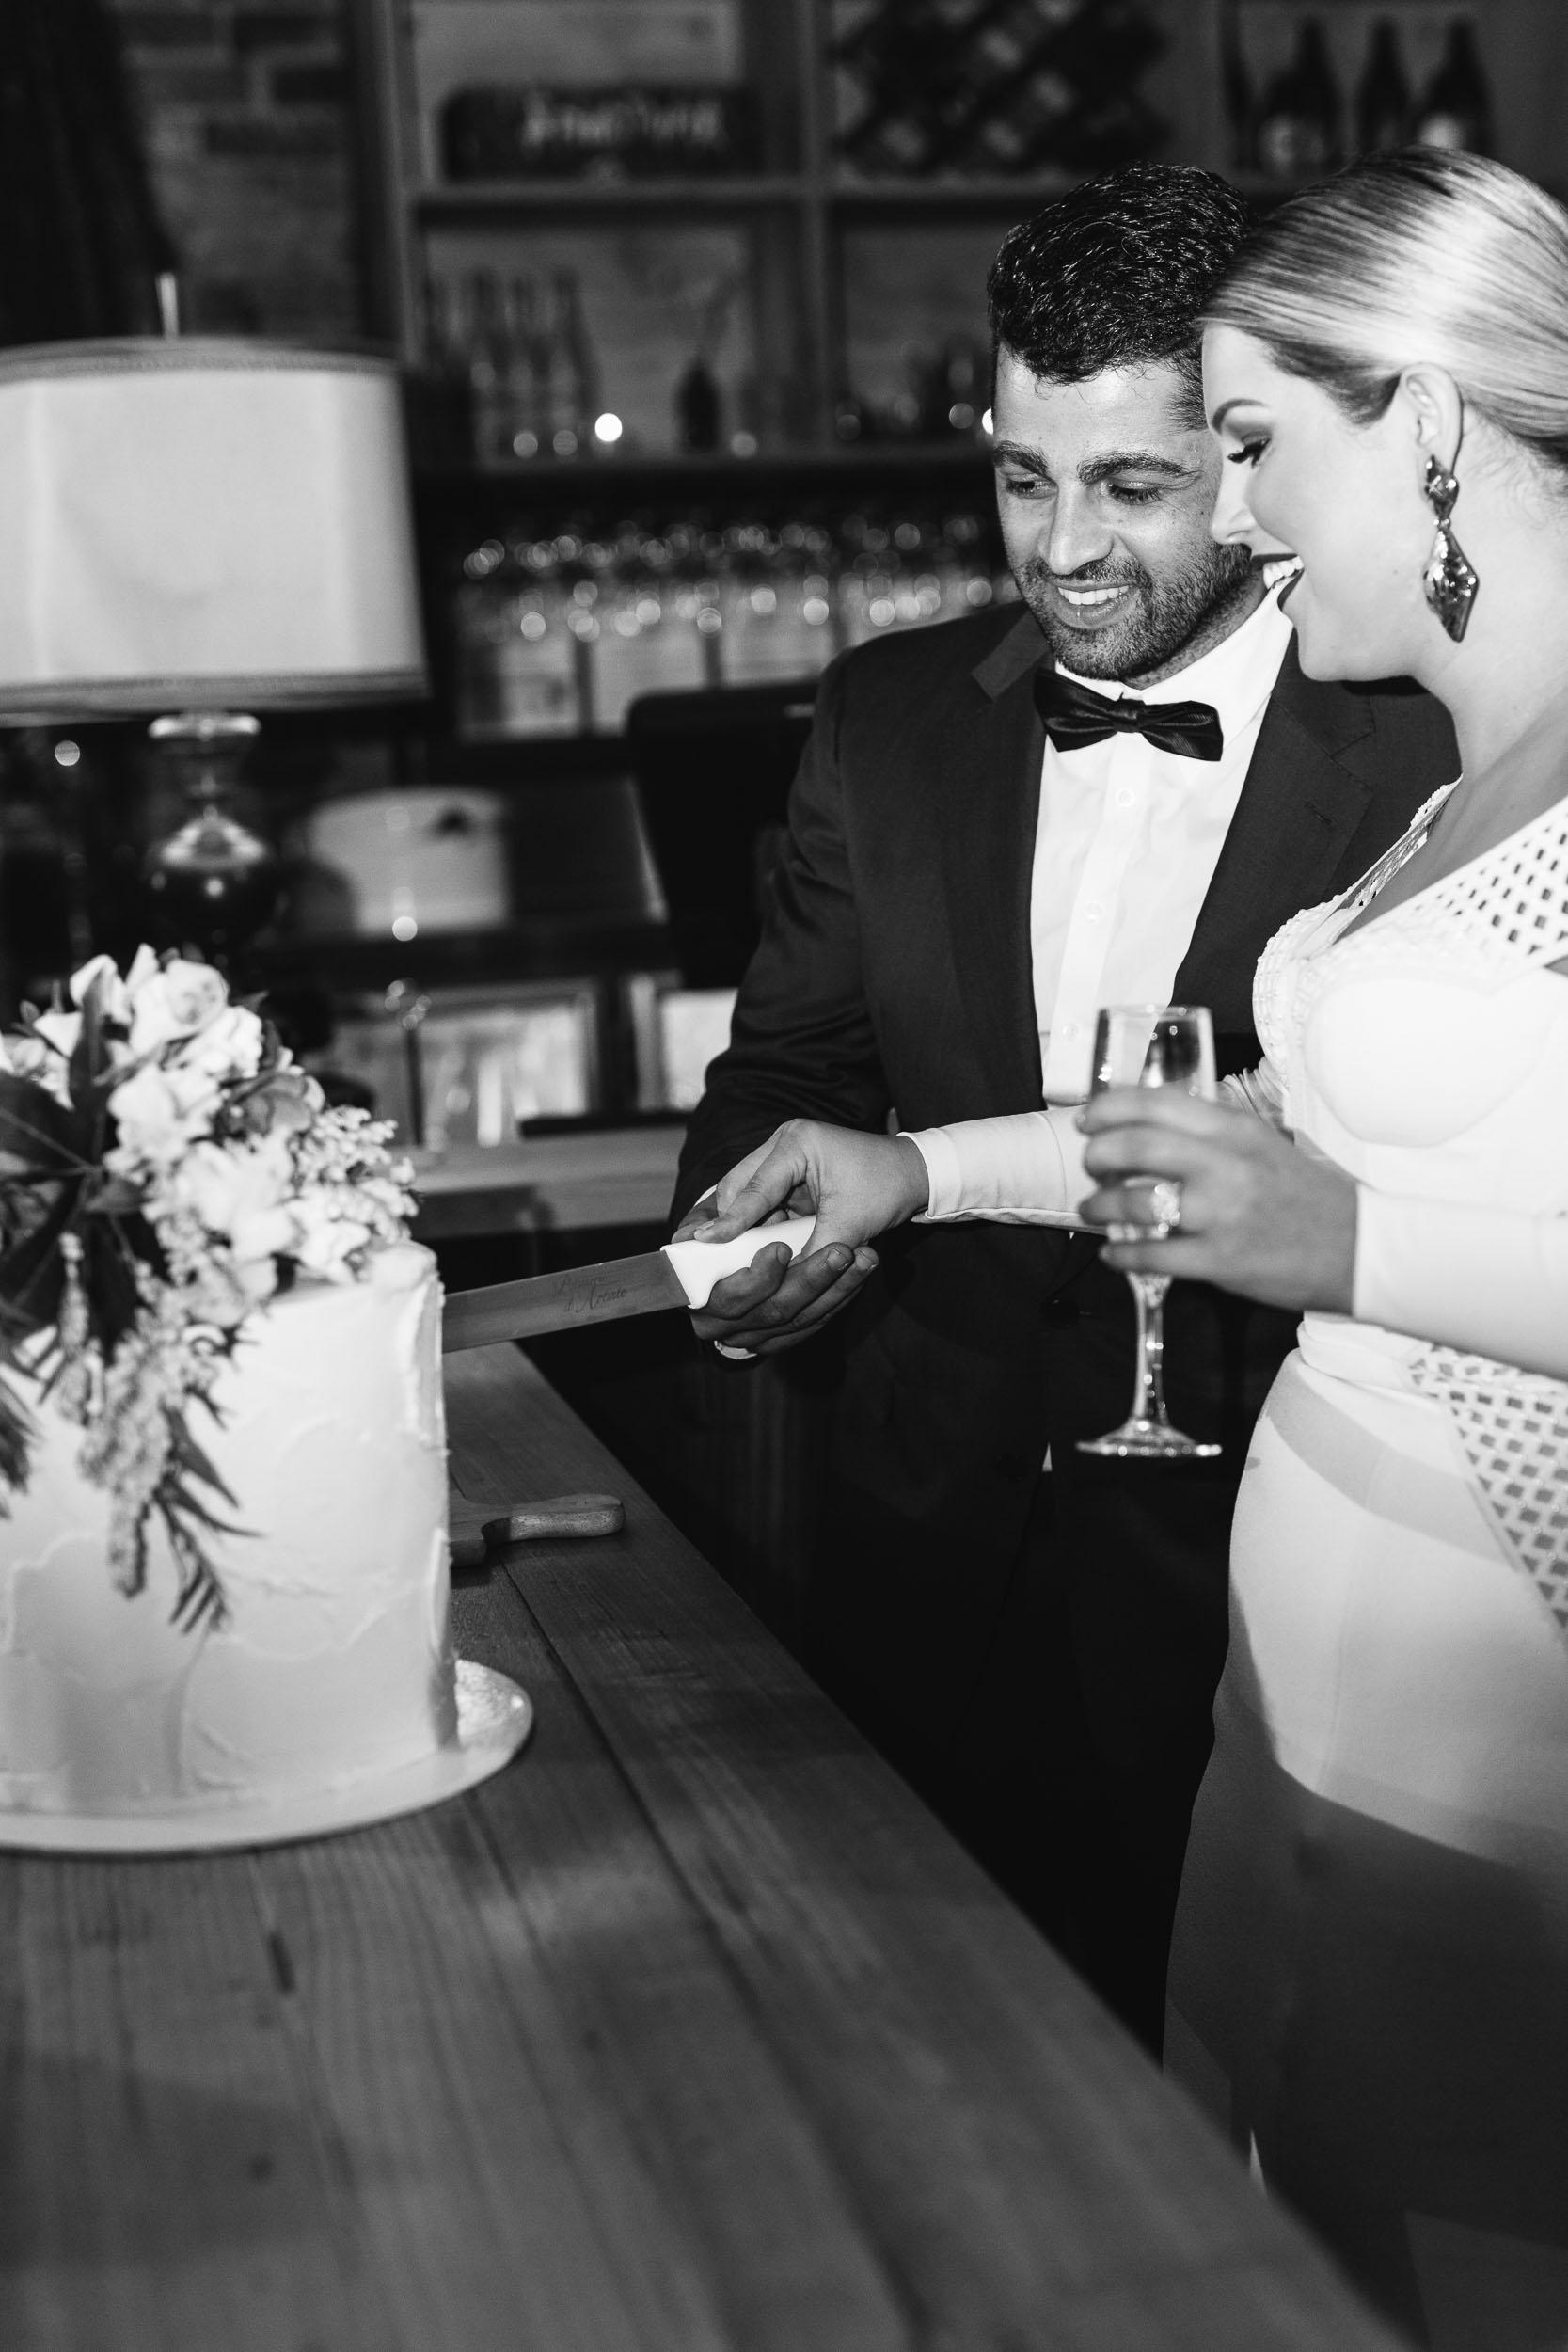 Kas-Richards-Urban-Melbourne-Wedding-Jason-Grech-673.jpg